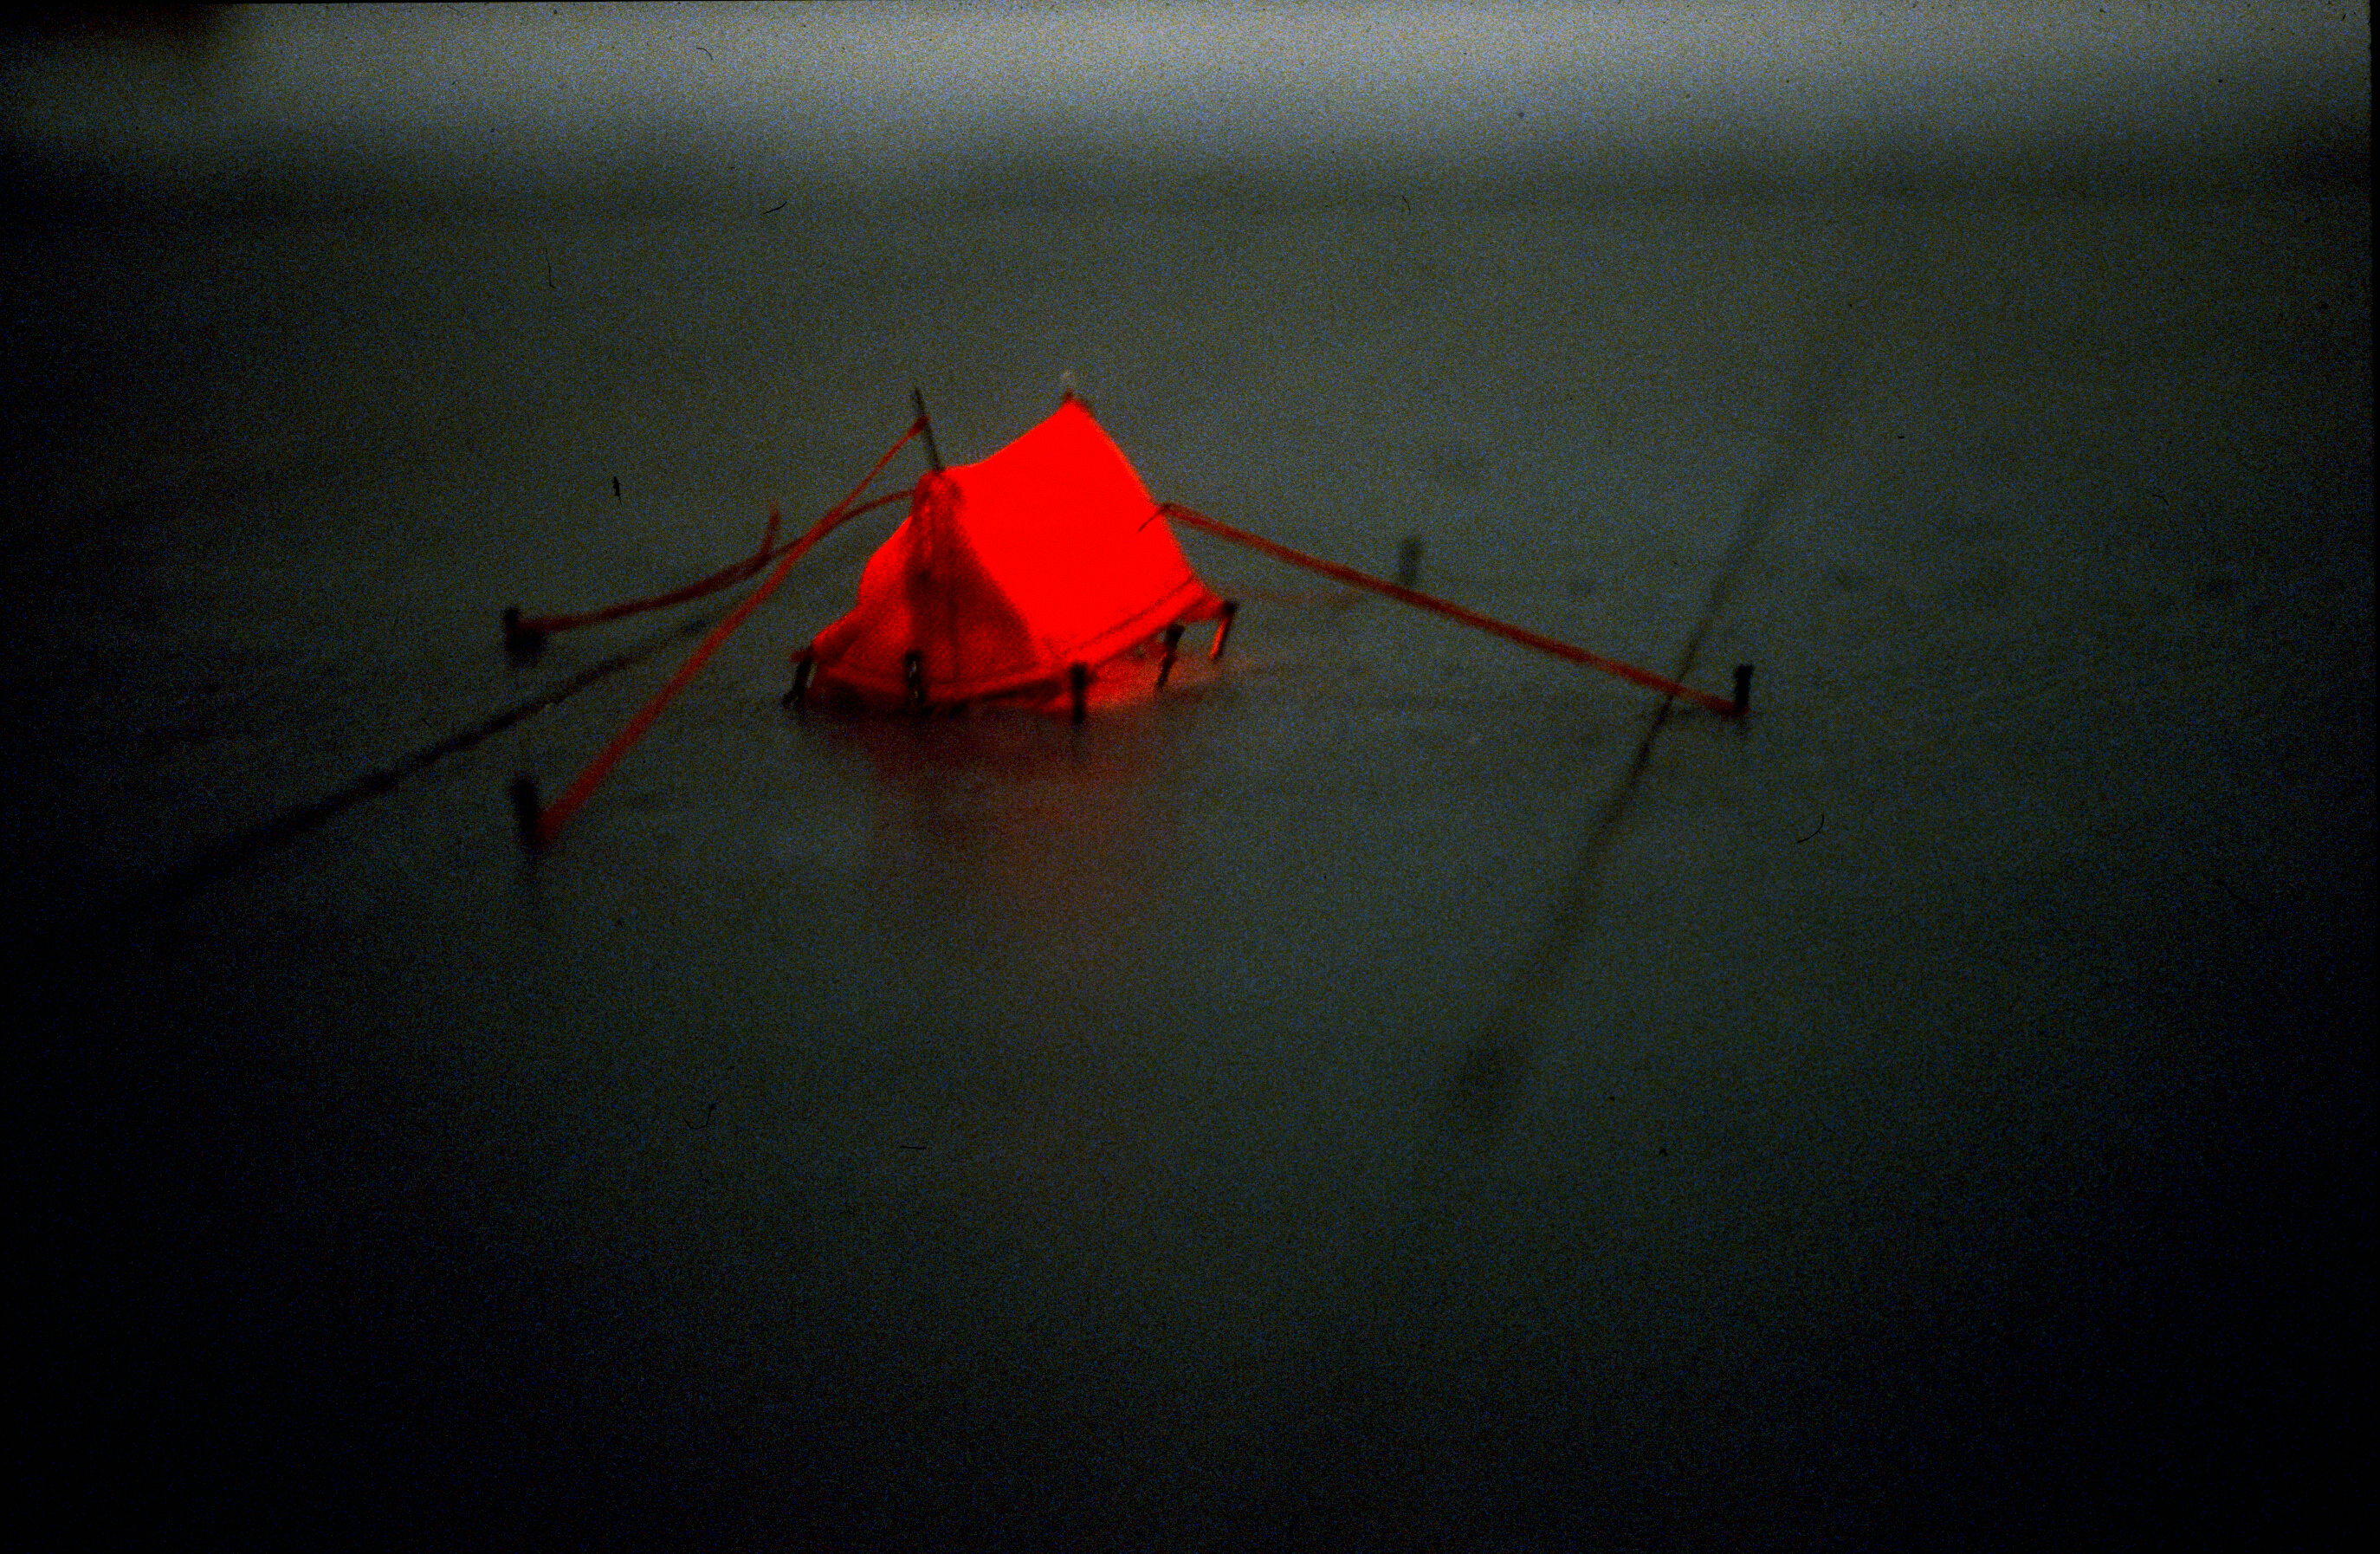 Miniature Tent Installation 2011 & Miniature Tent | Rosa Eaton